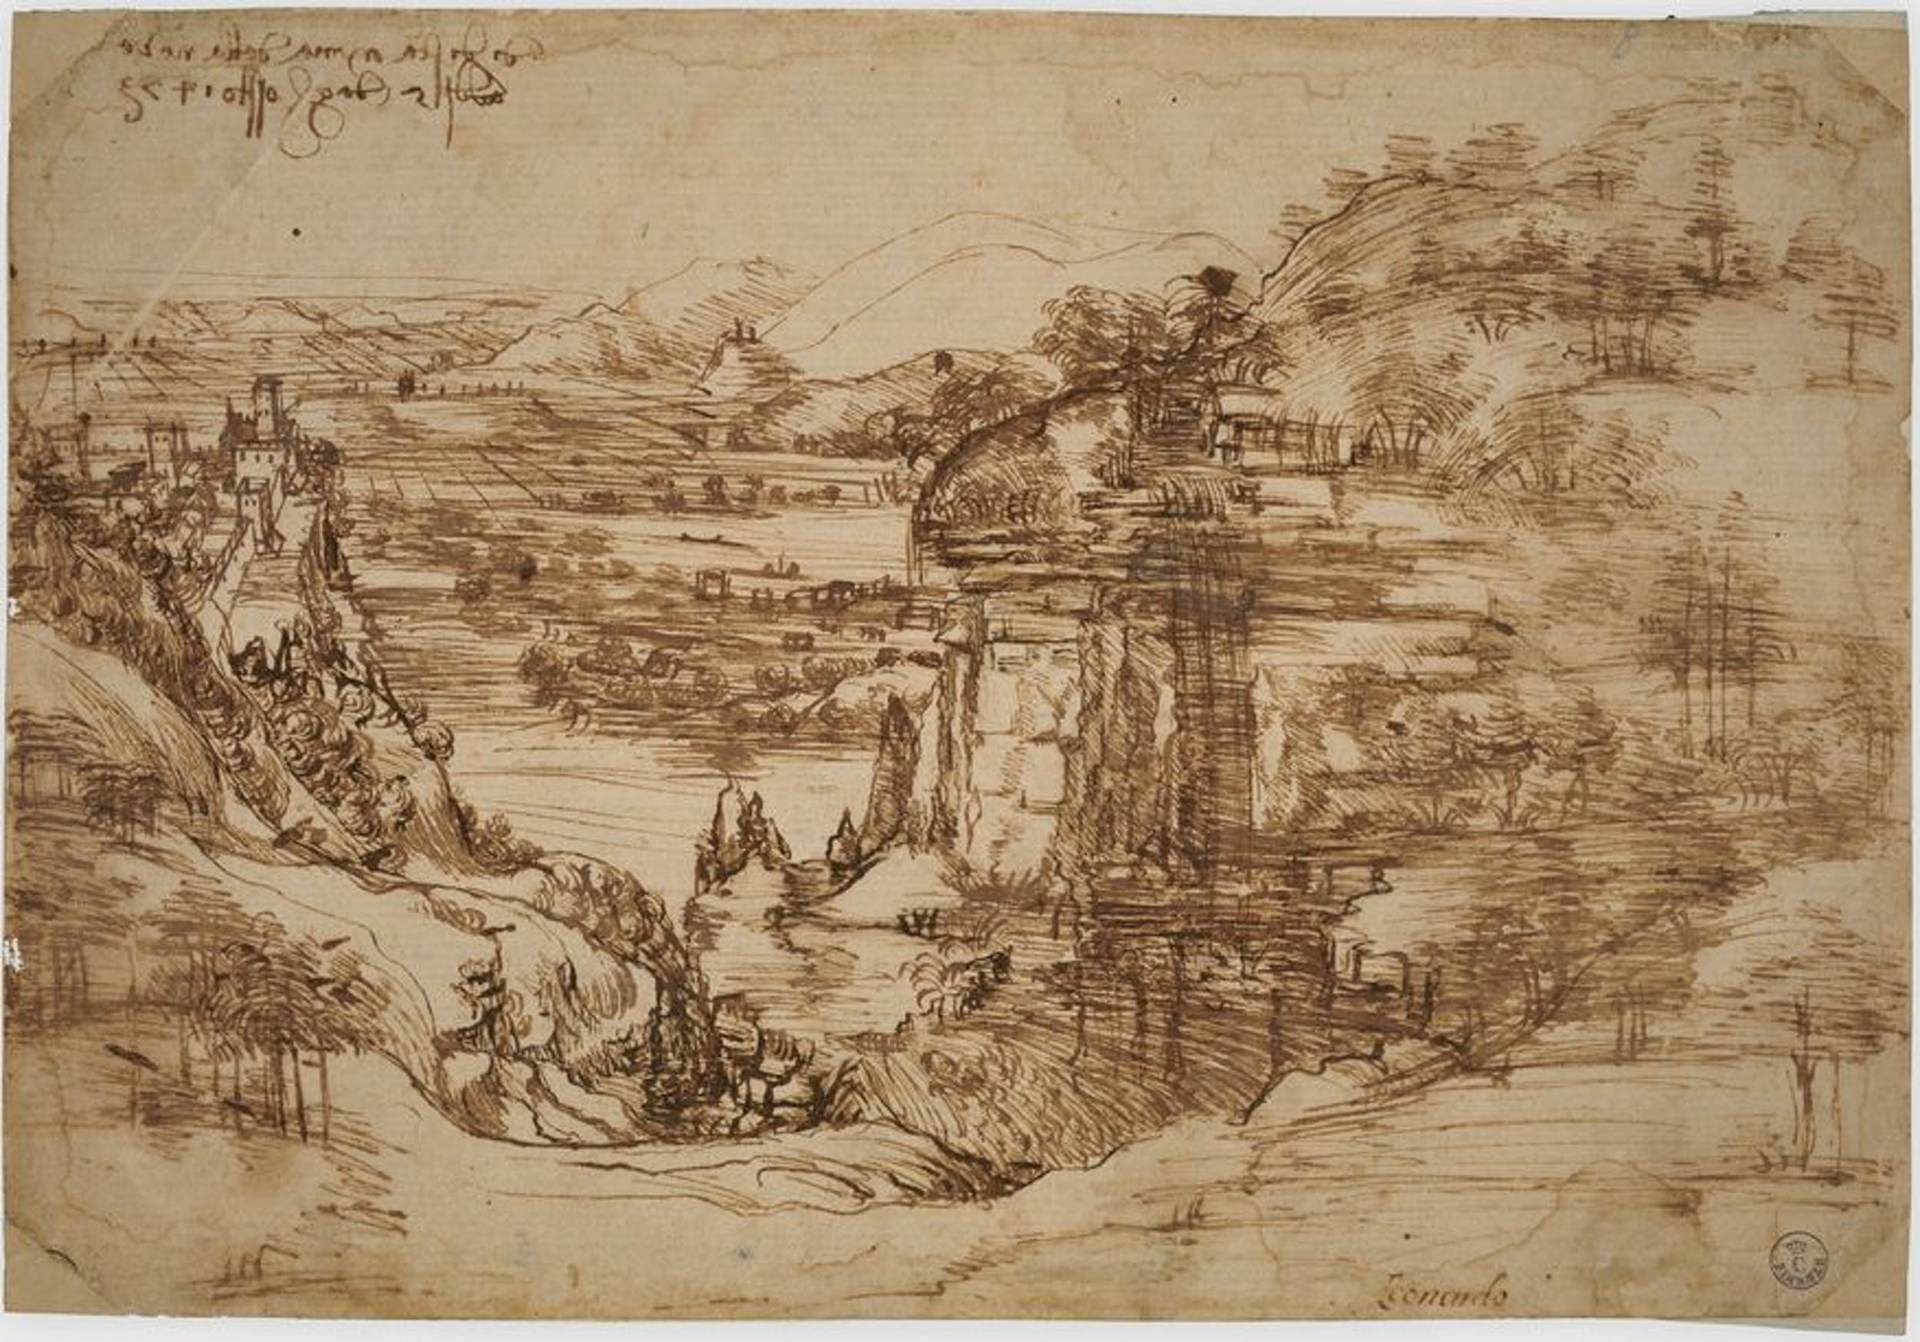 Da Vinci was ambidextrous, new handwriting analysis shows